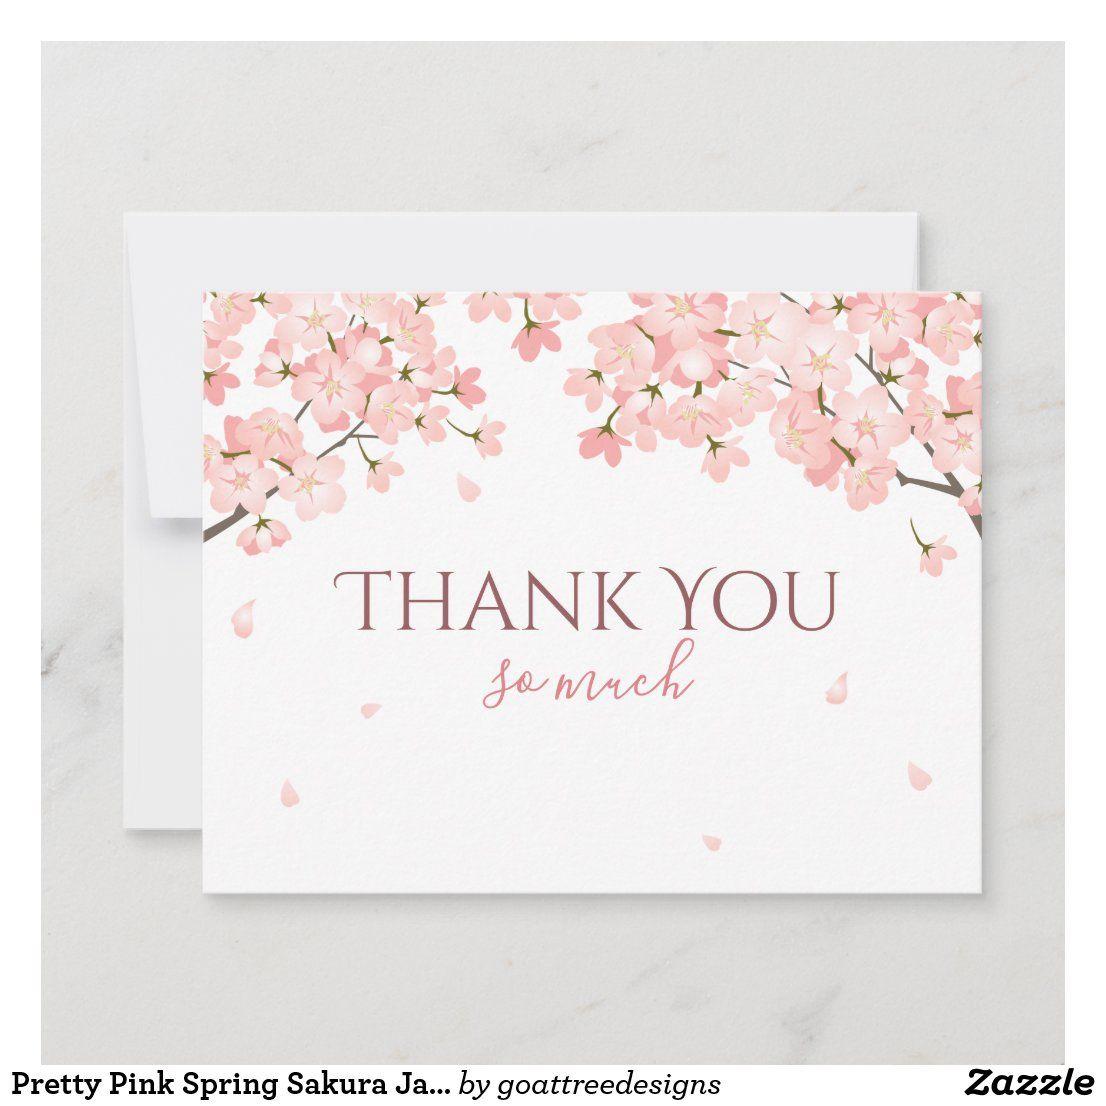 Pretty Pink Spring Sakura Japanese Cherry Blossoms Thank You Card Zazzle Com Japanese Cherry Japanese Cherry Blossom Pink Spring